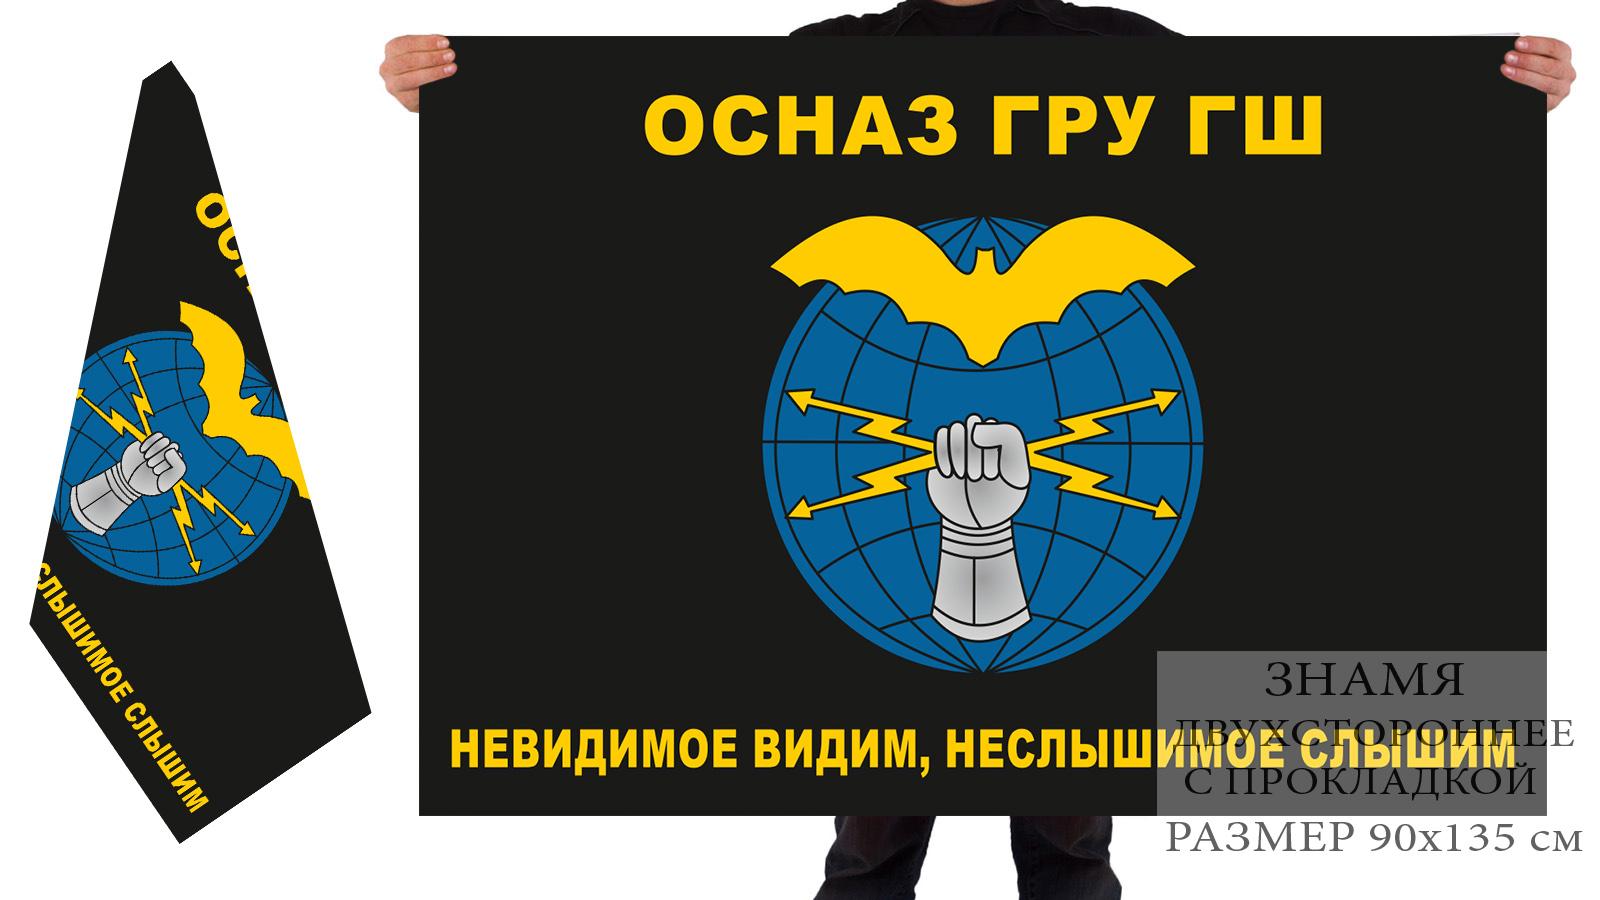 Купить двухсторонний флаг ОсНаз ГРУ ГШ